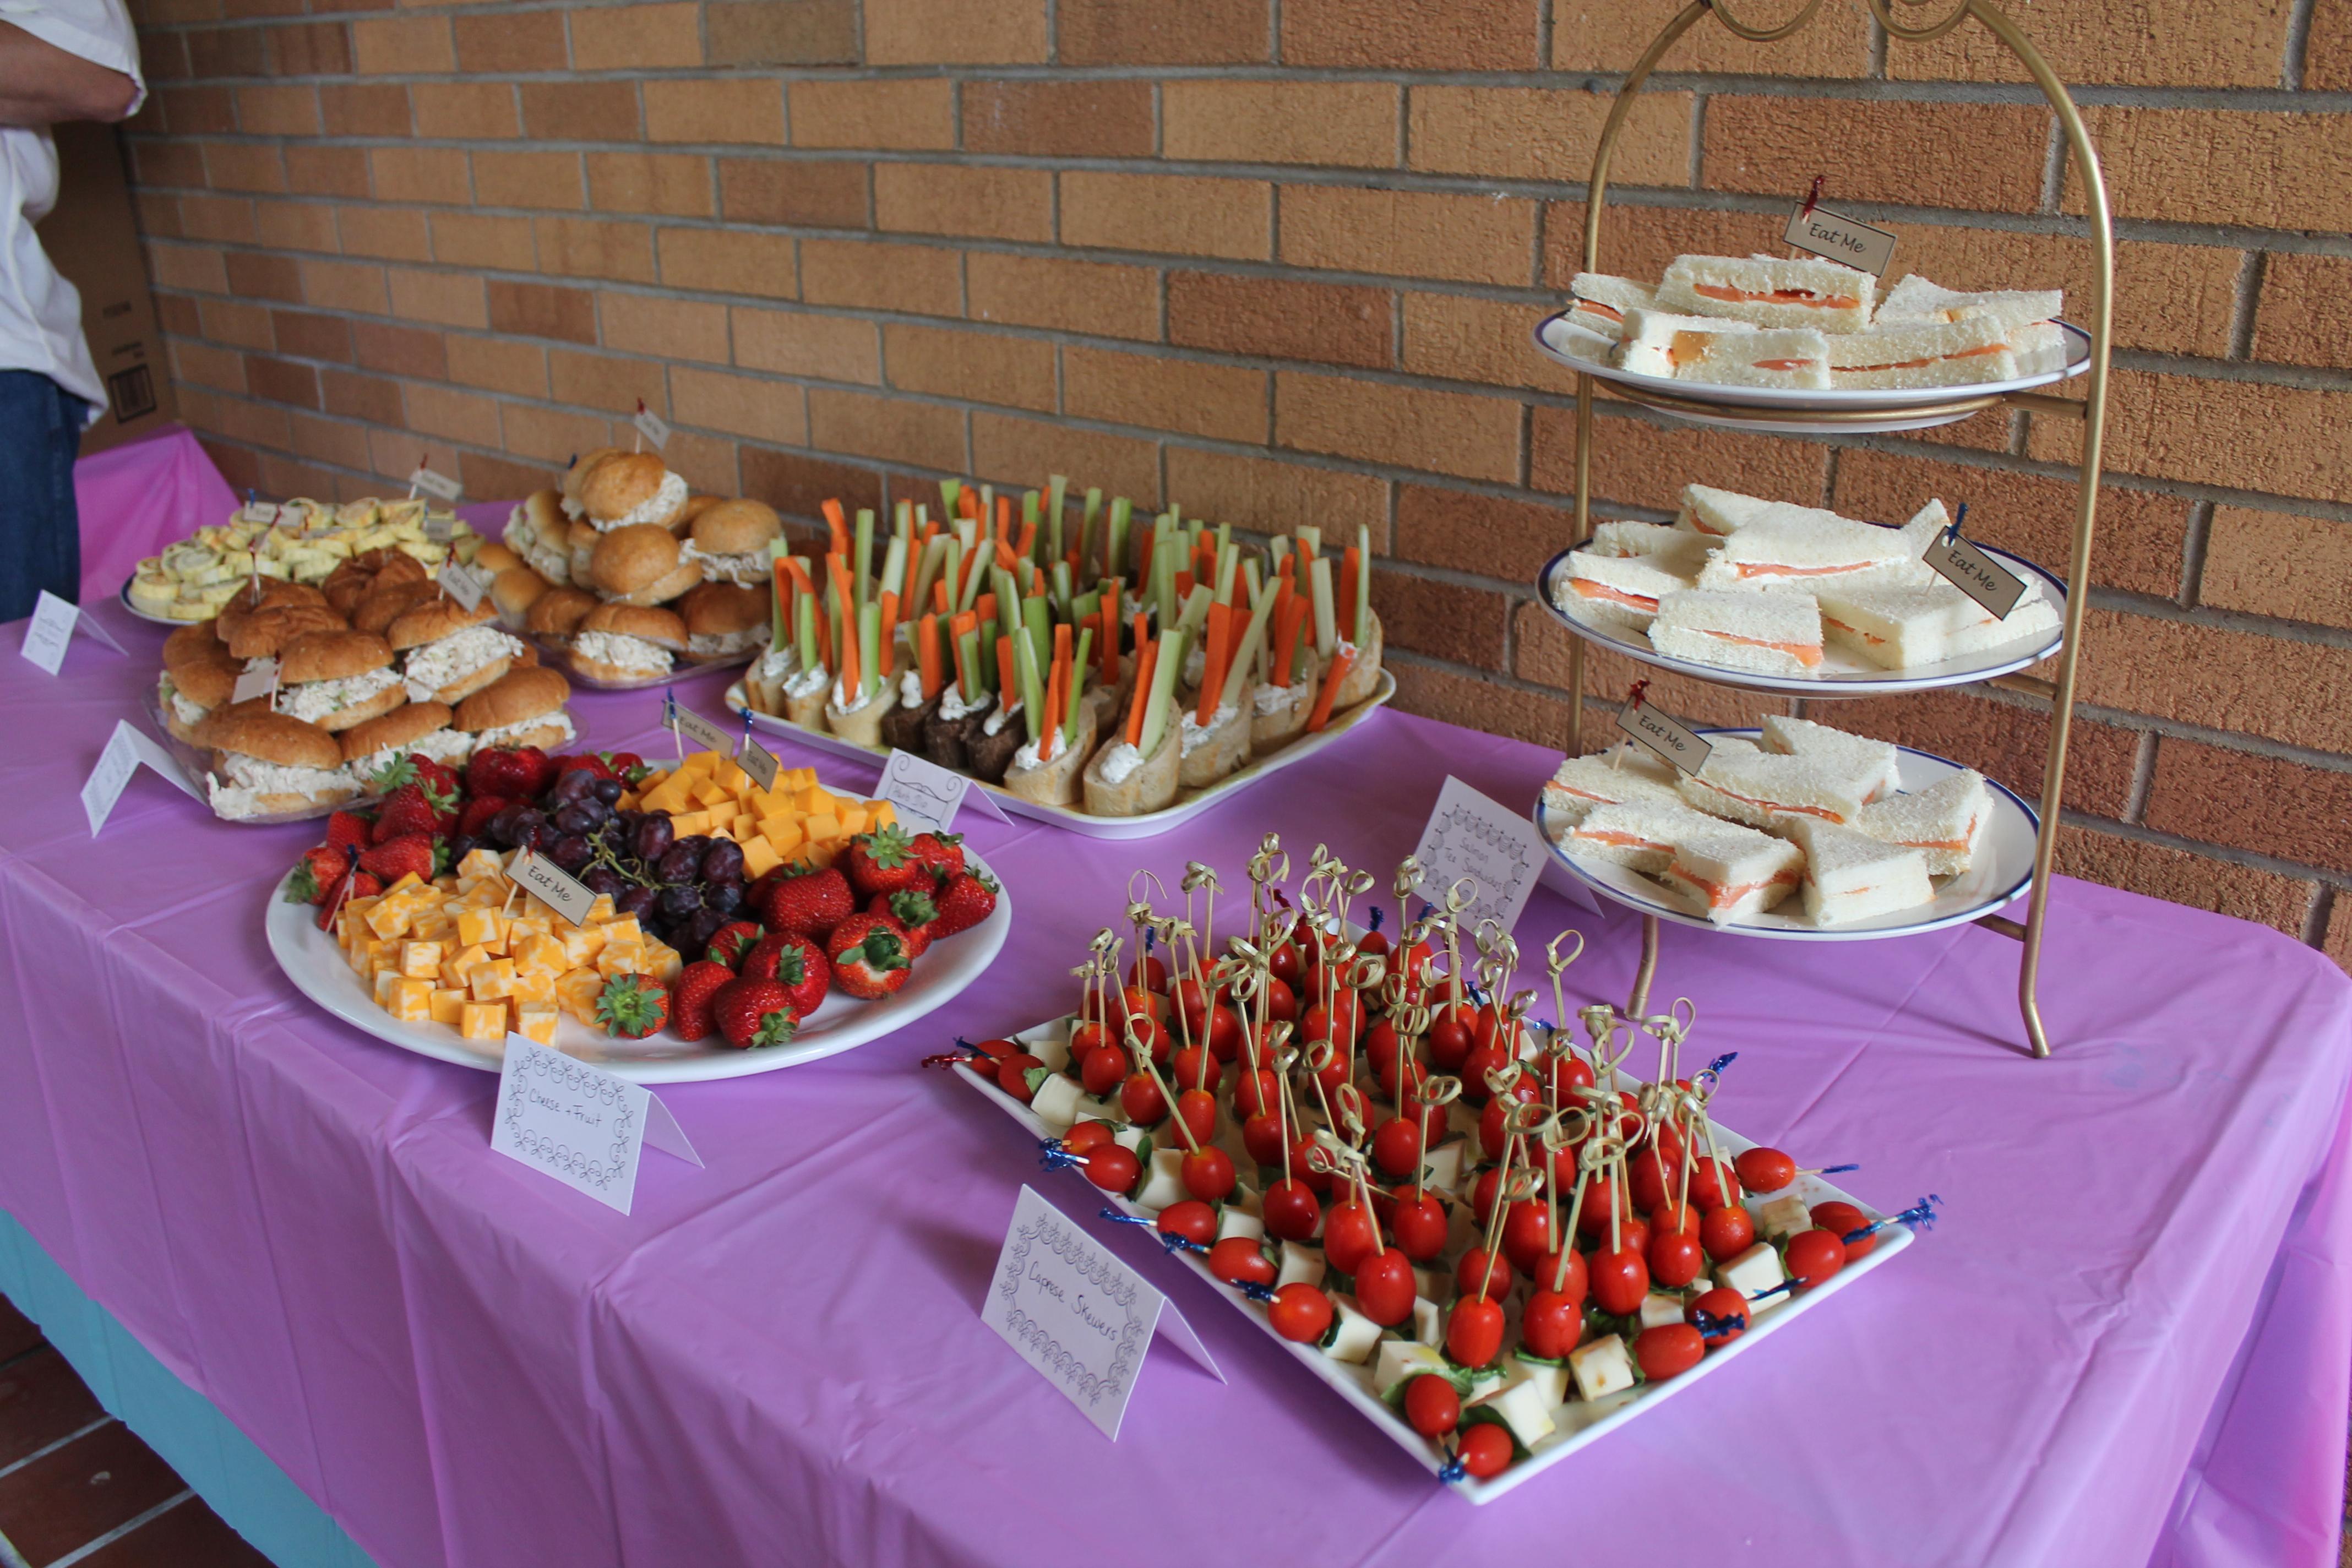 Outstanding Bekahs Sweet 16 048 Gina Maries Kitchen Home Interior And Landscaping Ponolsignezvosmurscom